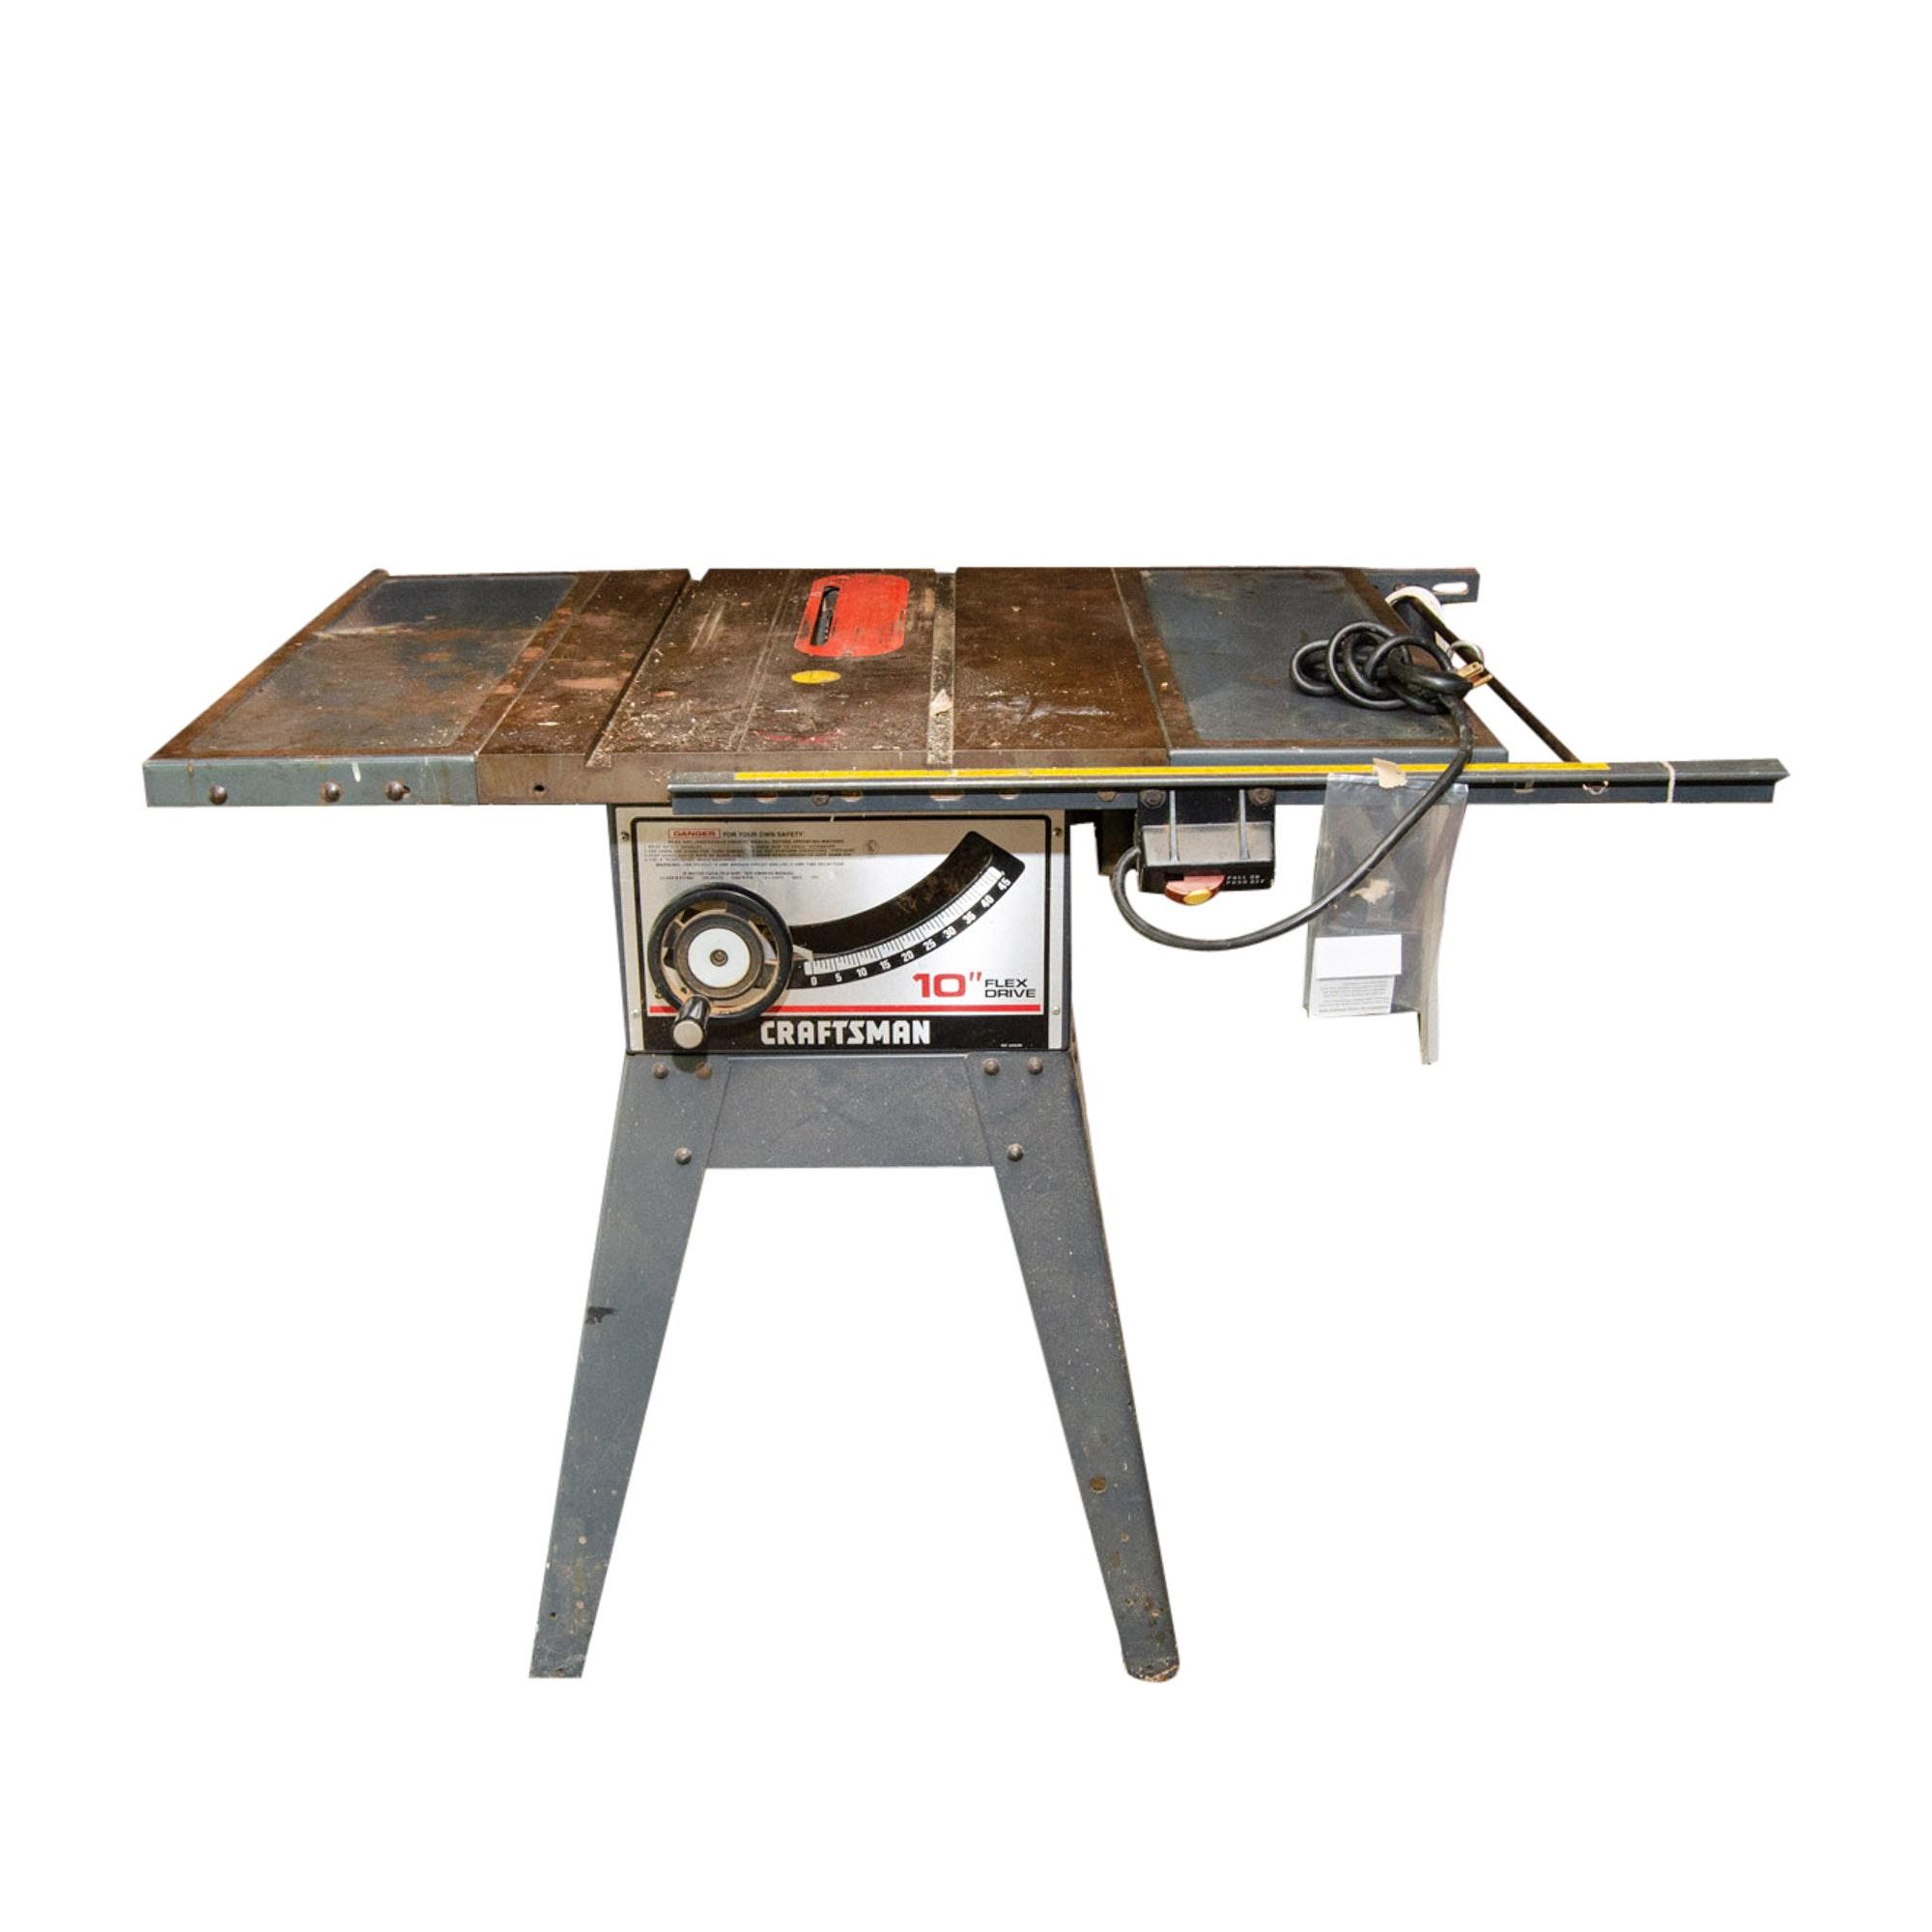 "Craftsman 10"" Flex Drive Table Saw"